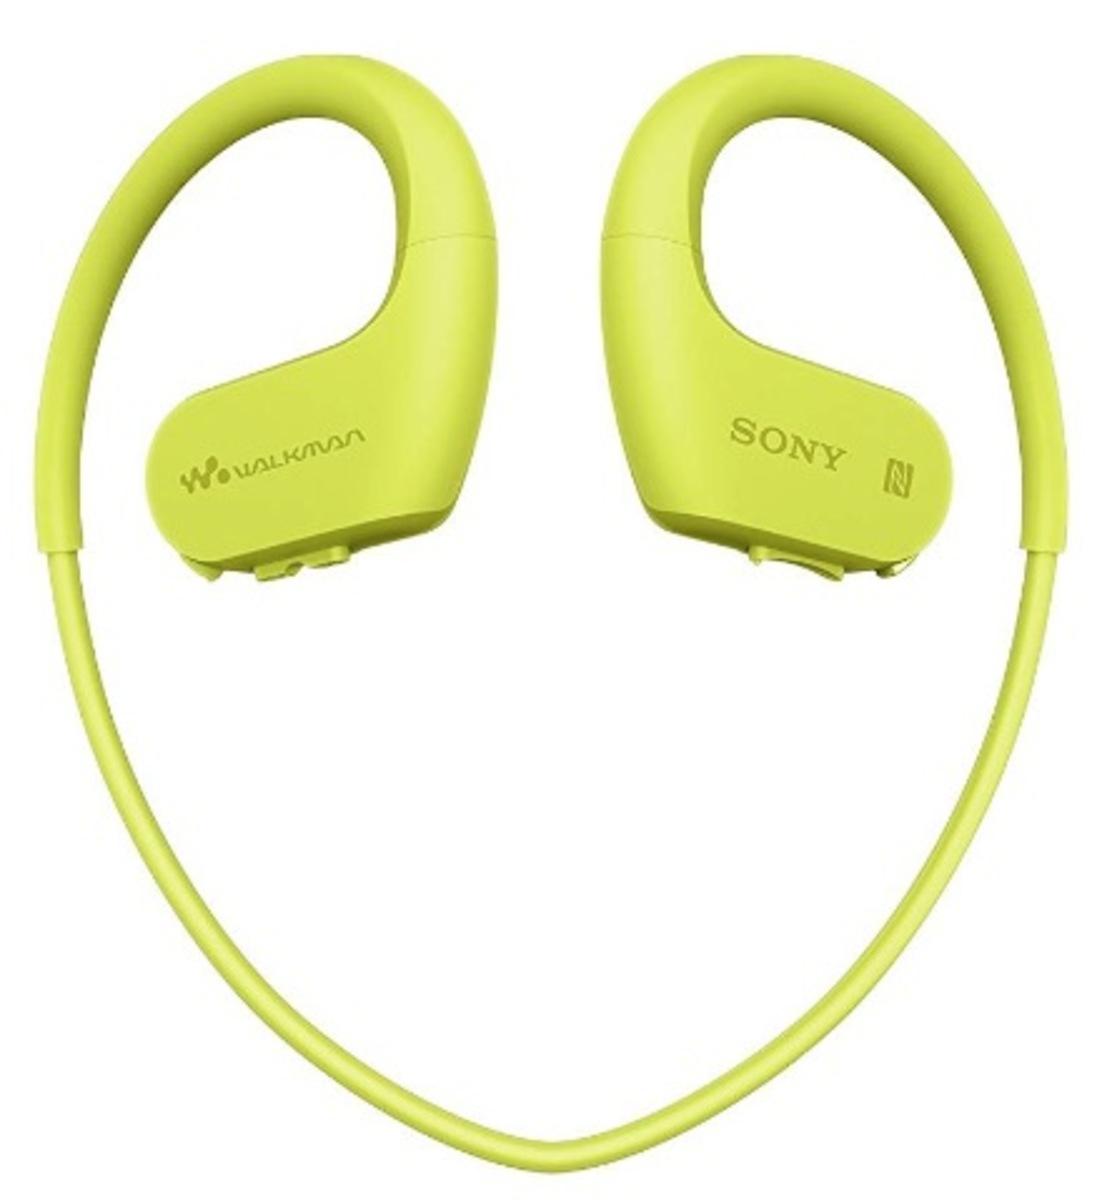 NW-WS623 Waterproof MP3 Player bluetooth Earphones [Lime Green]